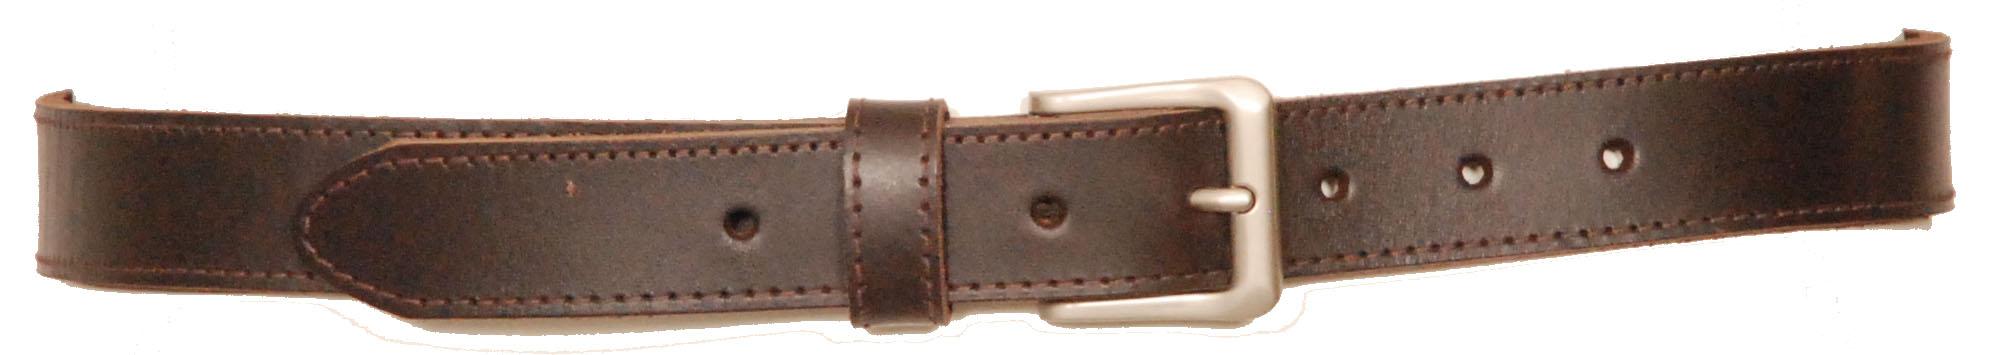 30mm regular chunky leather belt barden euroa clothing